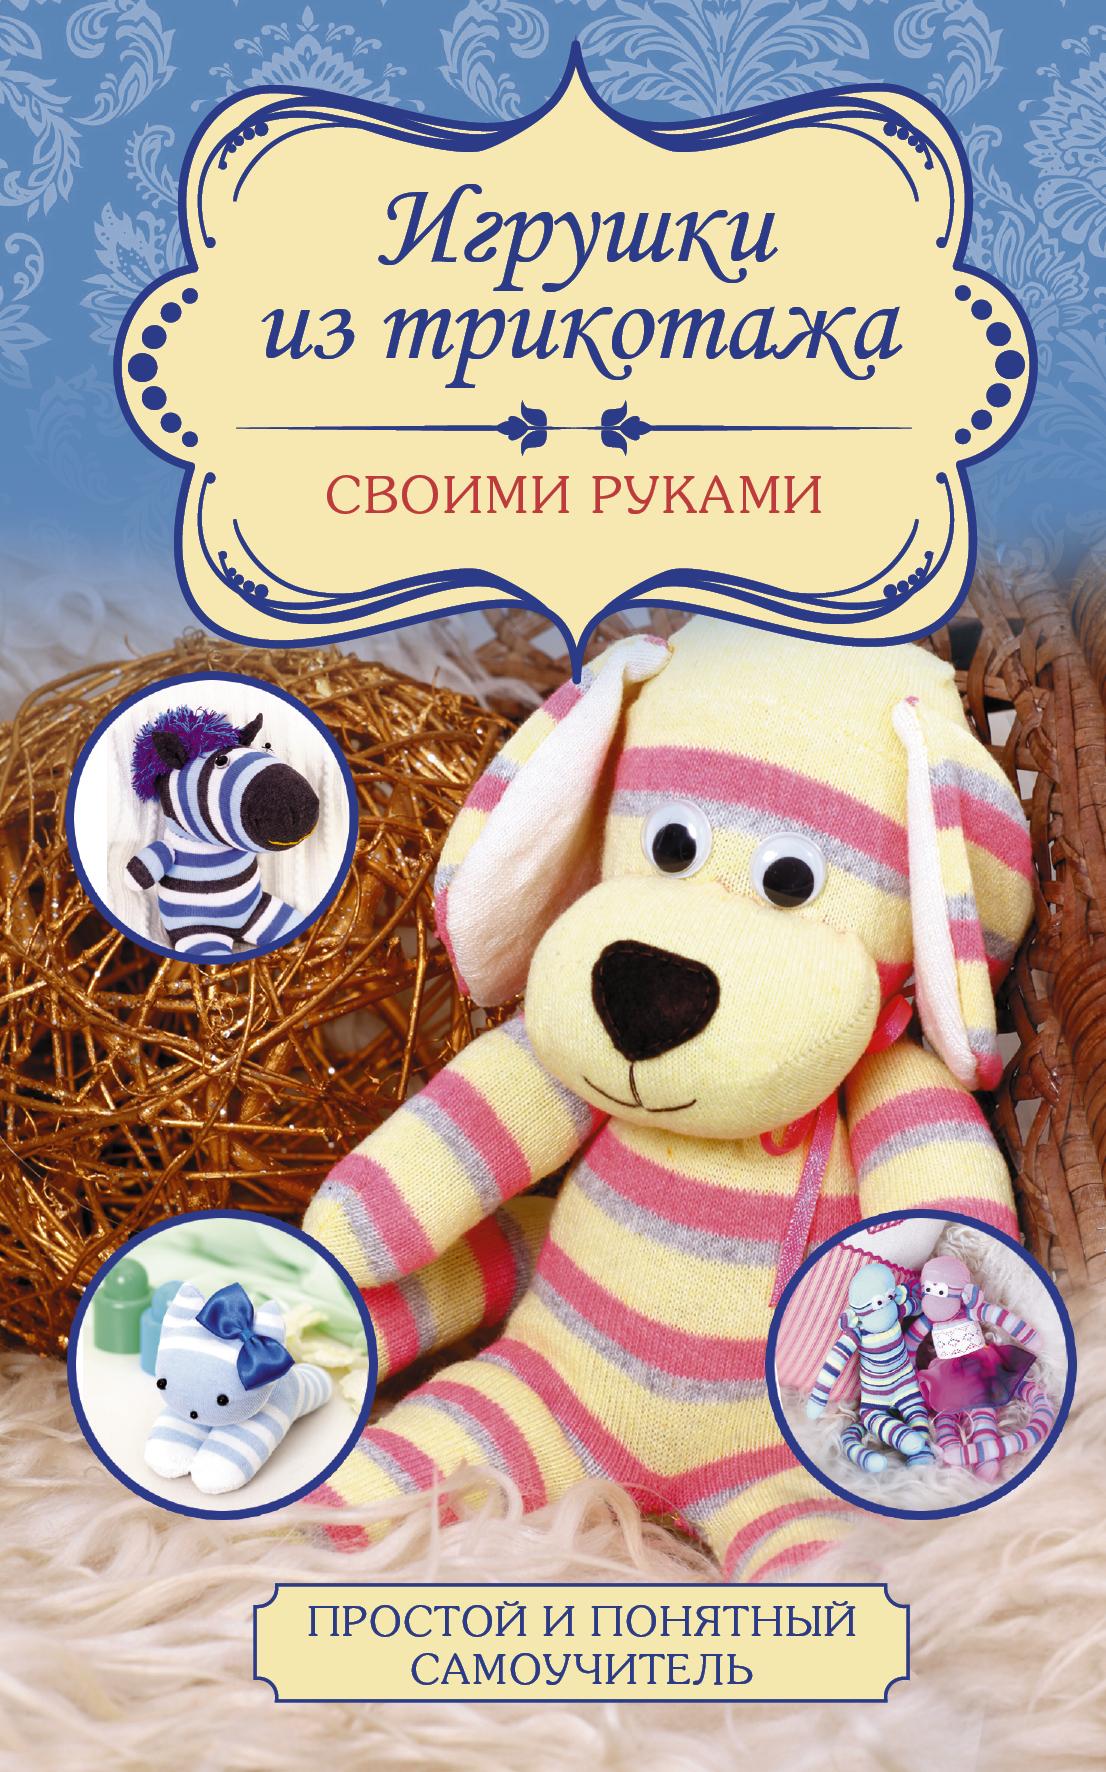 Л. М. Чернобаева Игрушки из трикотажа своими руками чемодурова т мягкие игрушки своими руками 30 оригинальных изделий